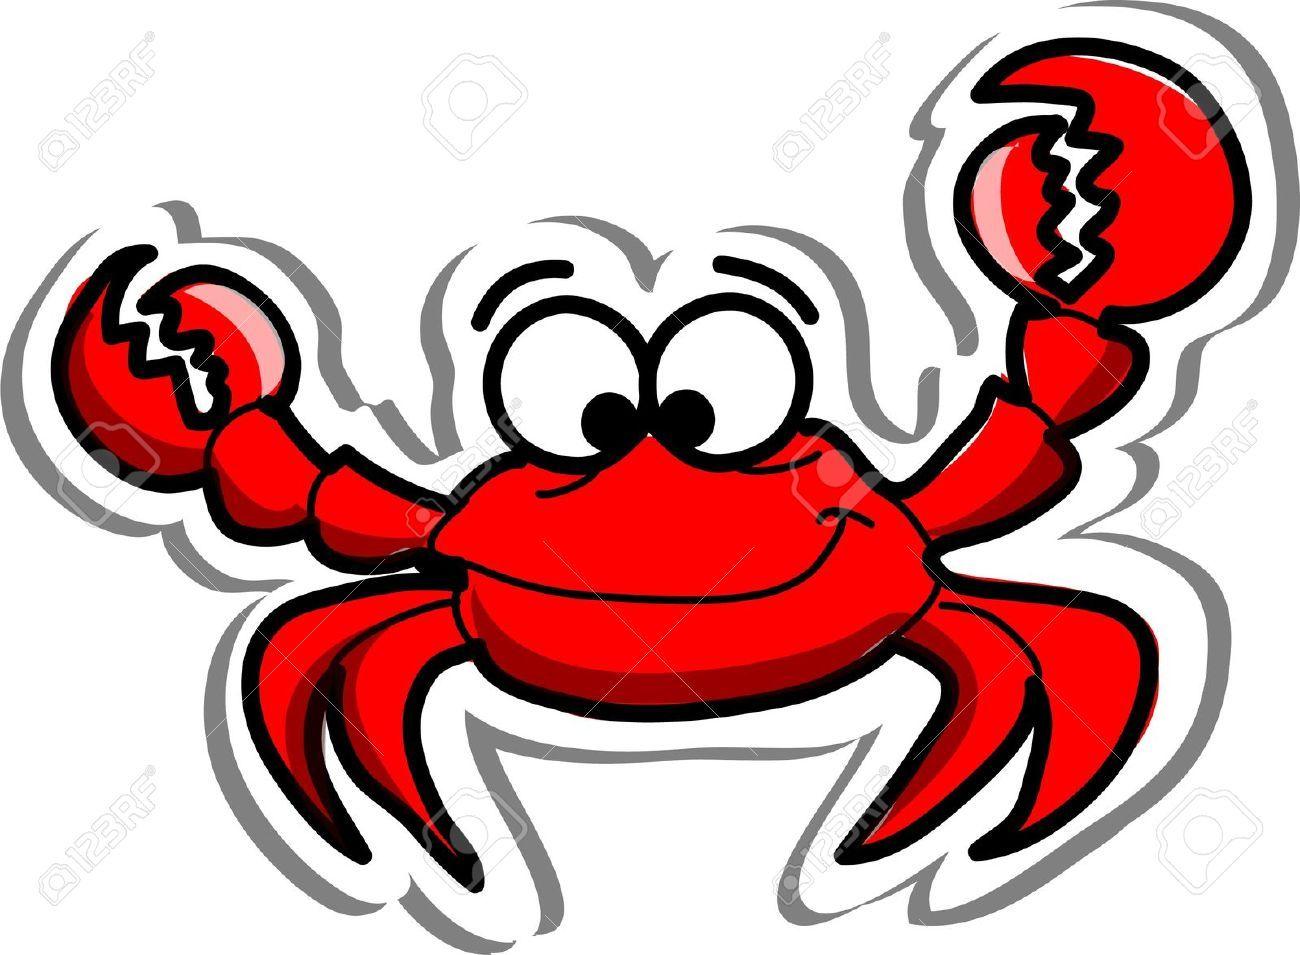 crabs stock illustrations cliparts and royalty free crabs vectors [ 1300 x 955 Pixel ]